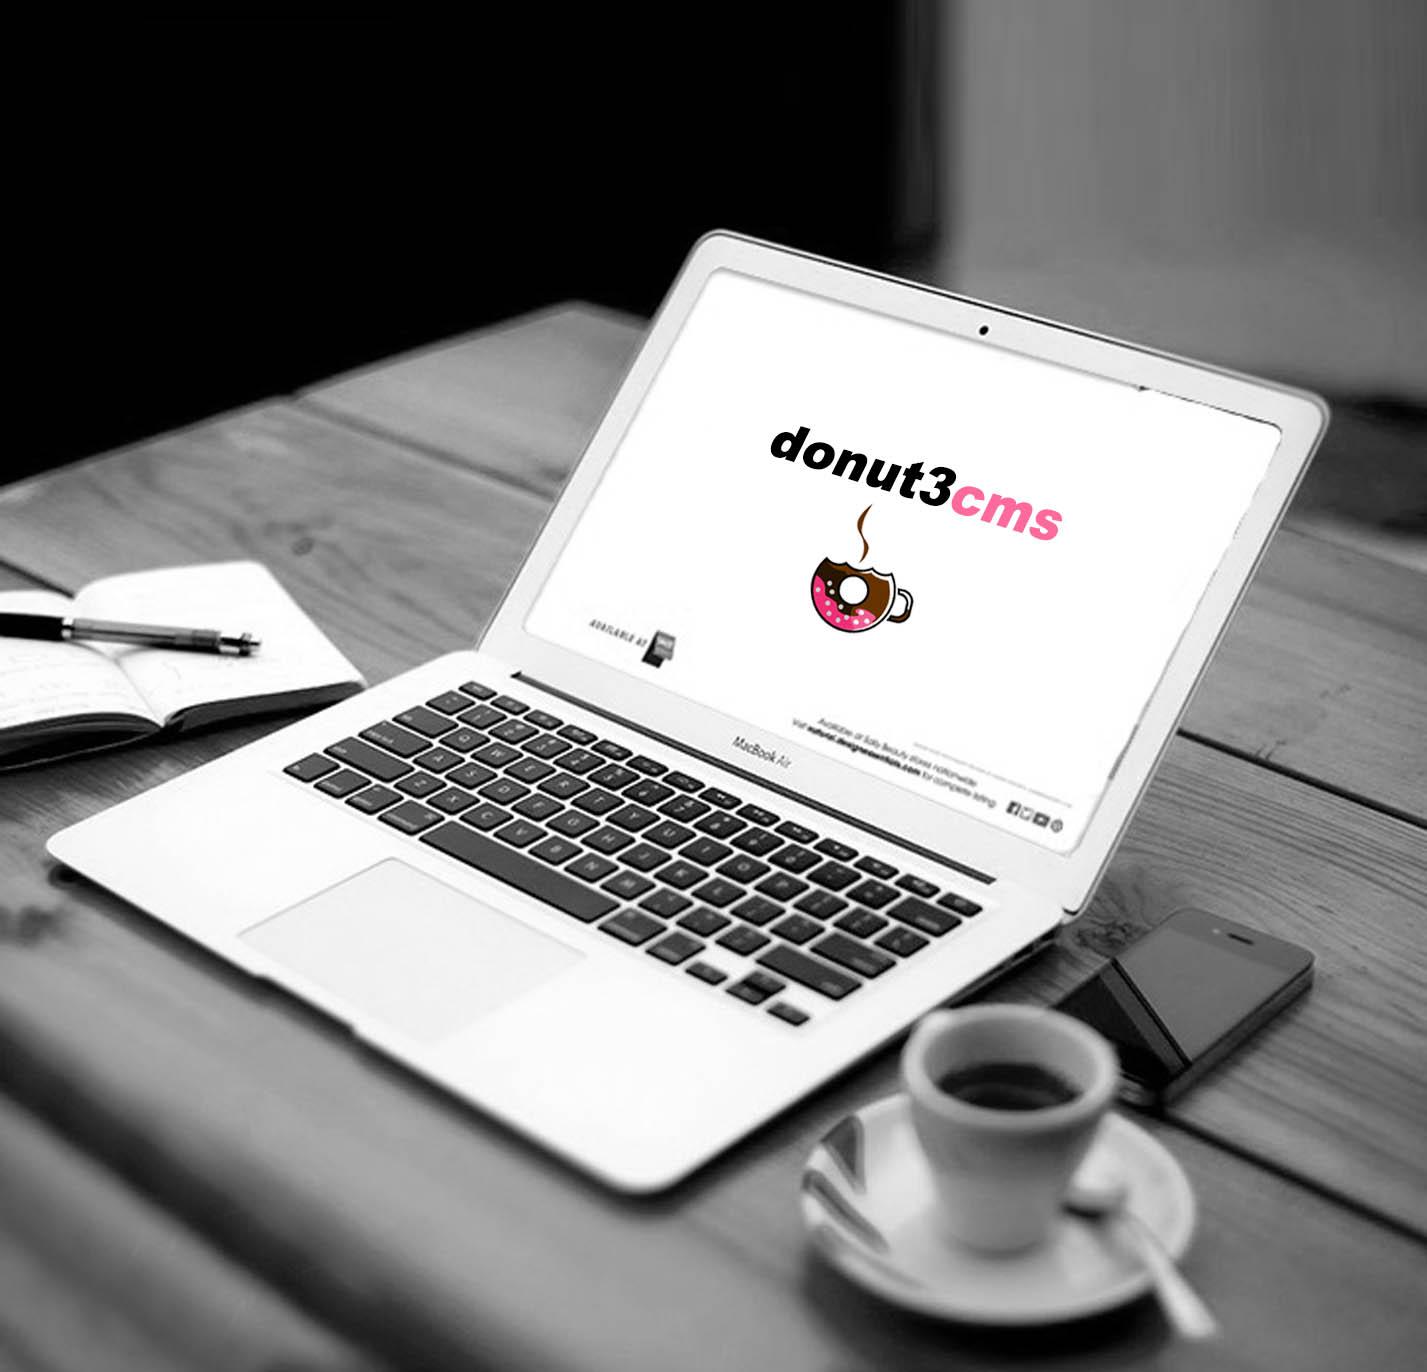 Digilopment CMS Donut 3